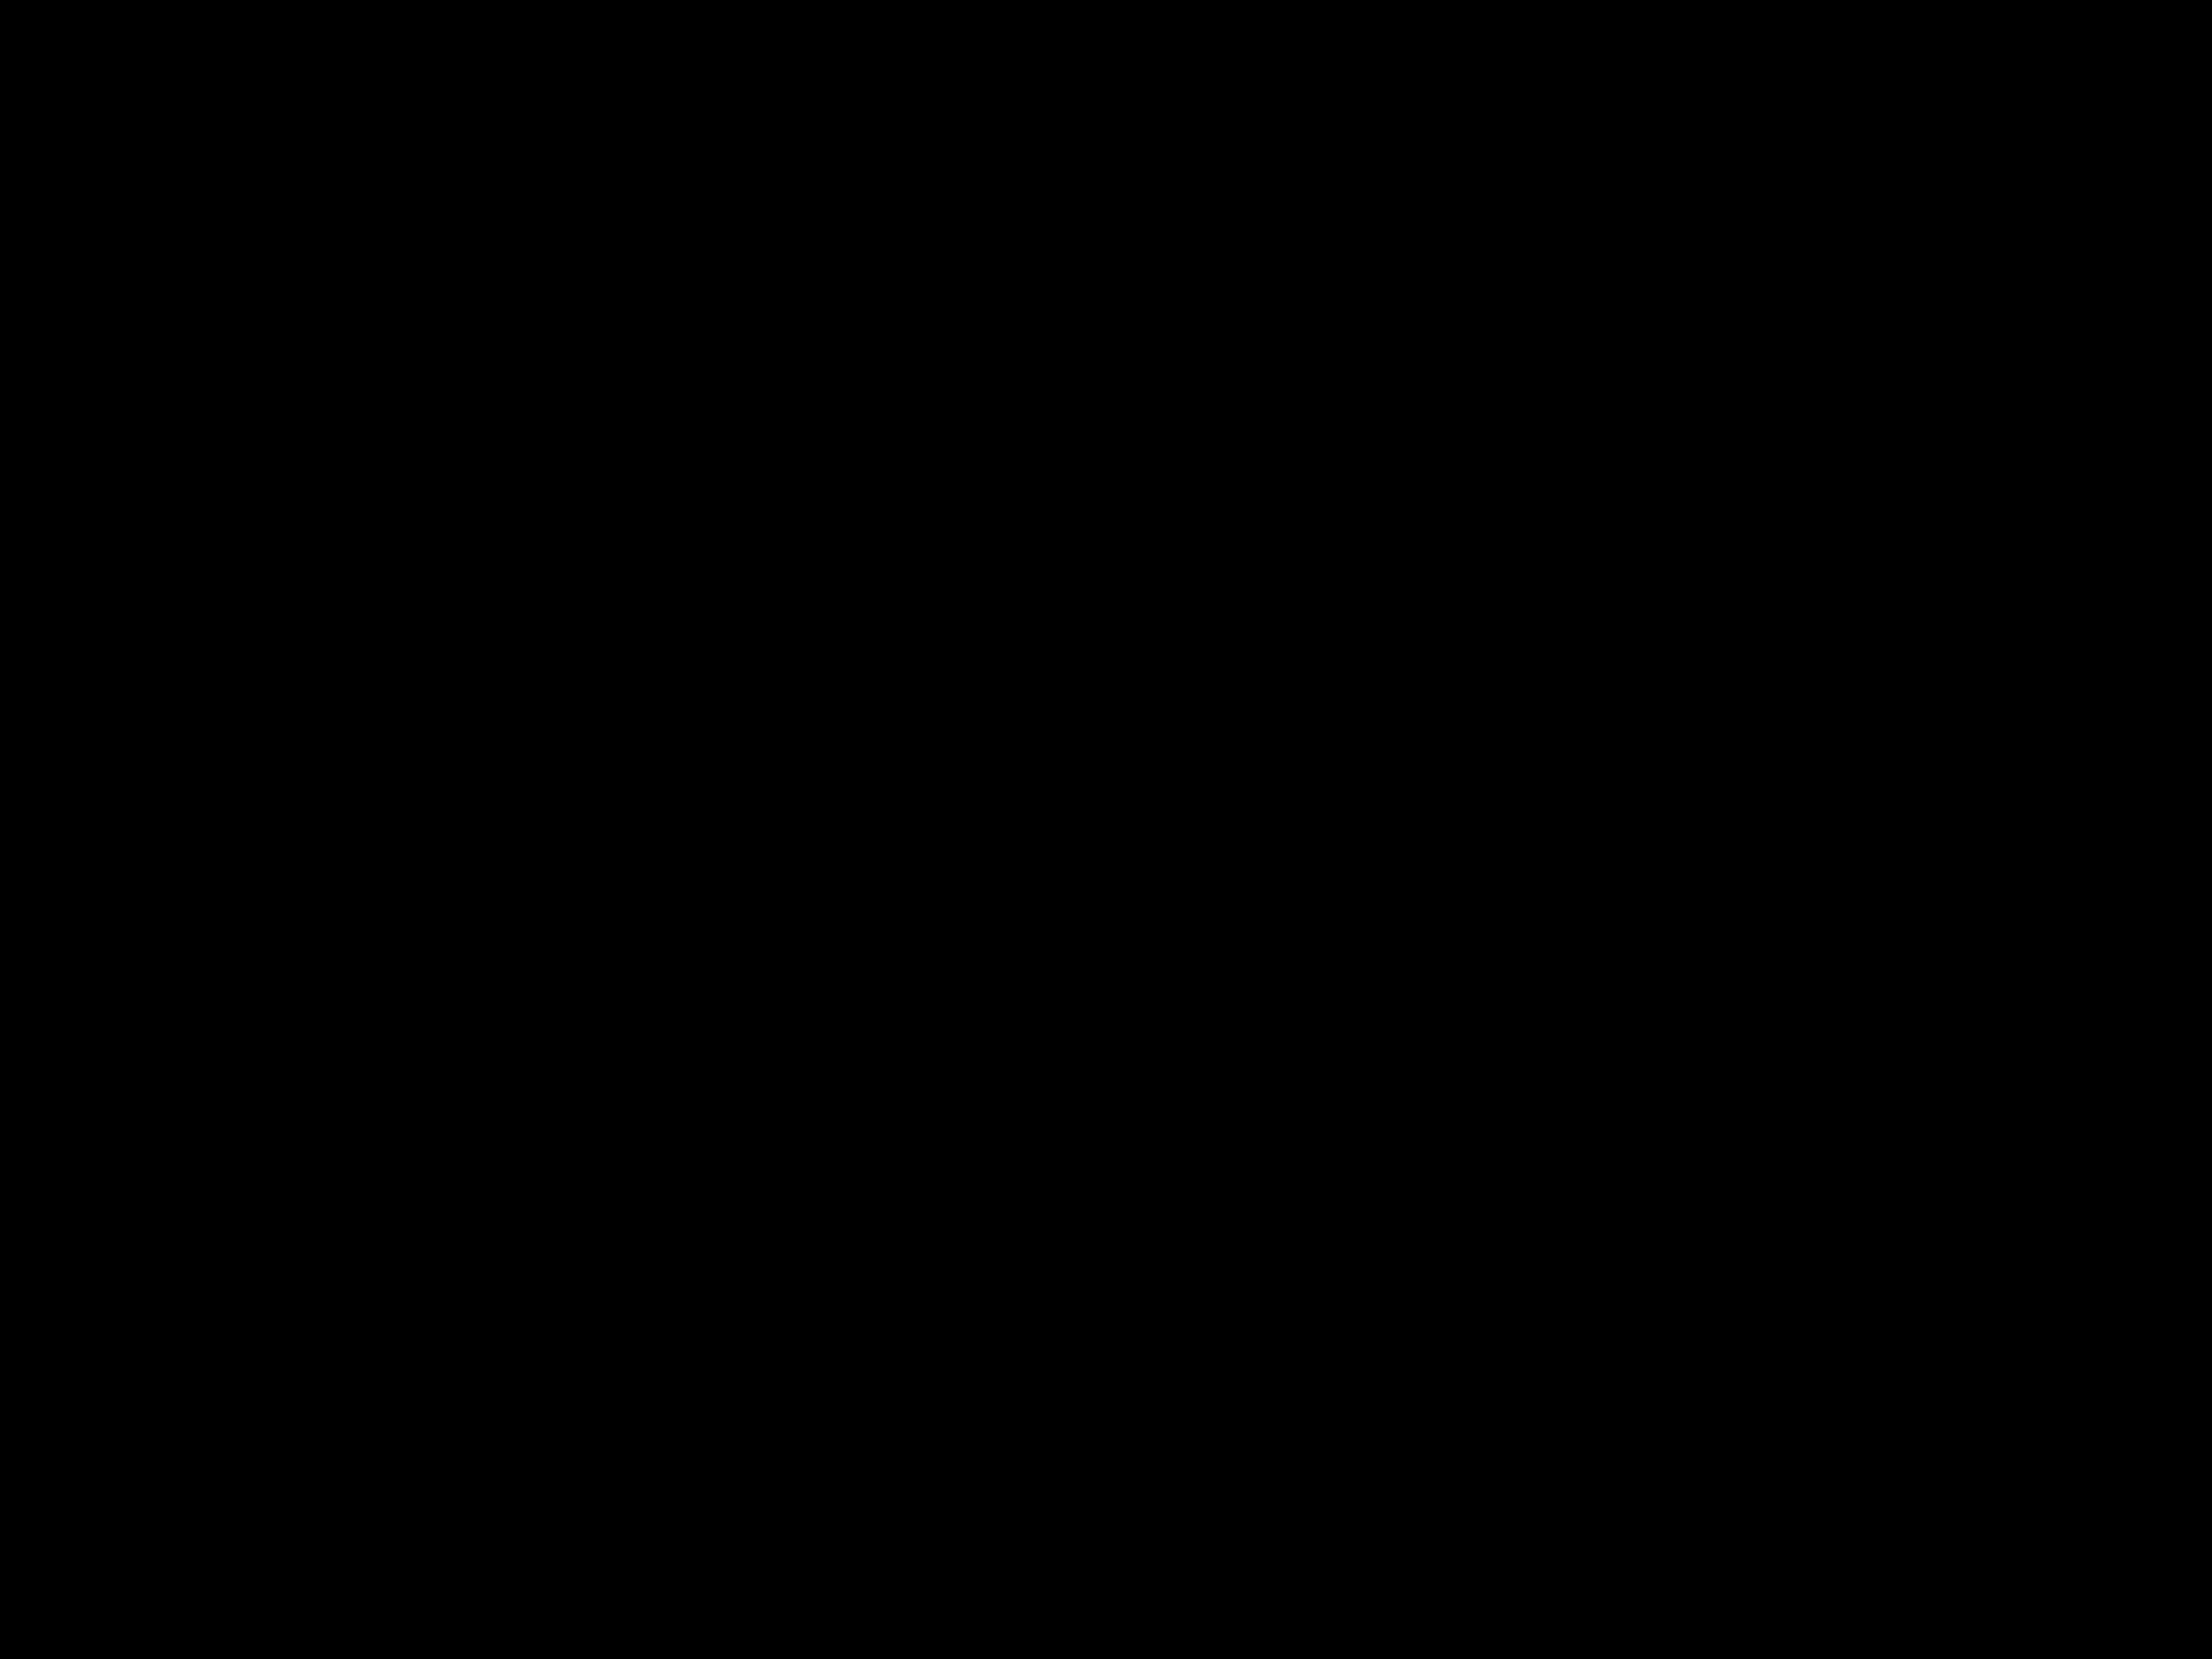 2400x1800 Clipart Laurel Wreath Black